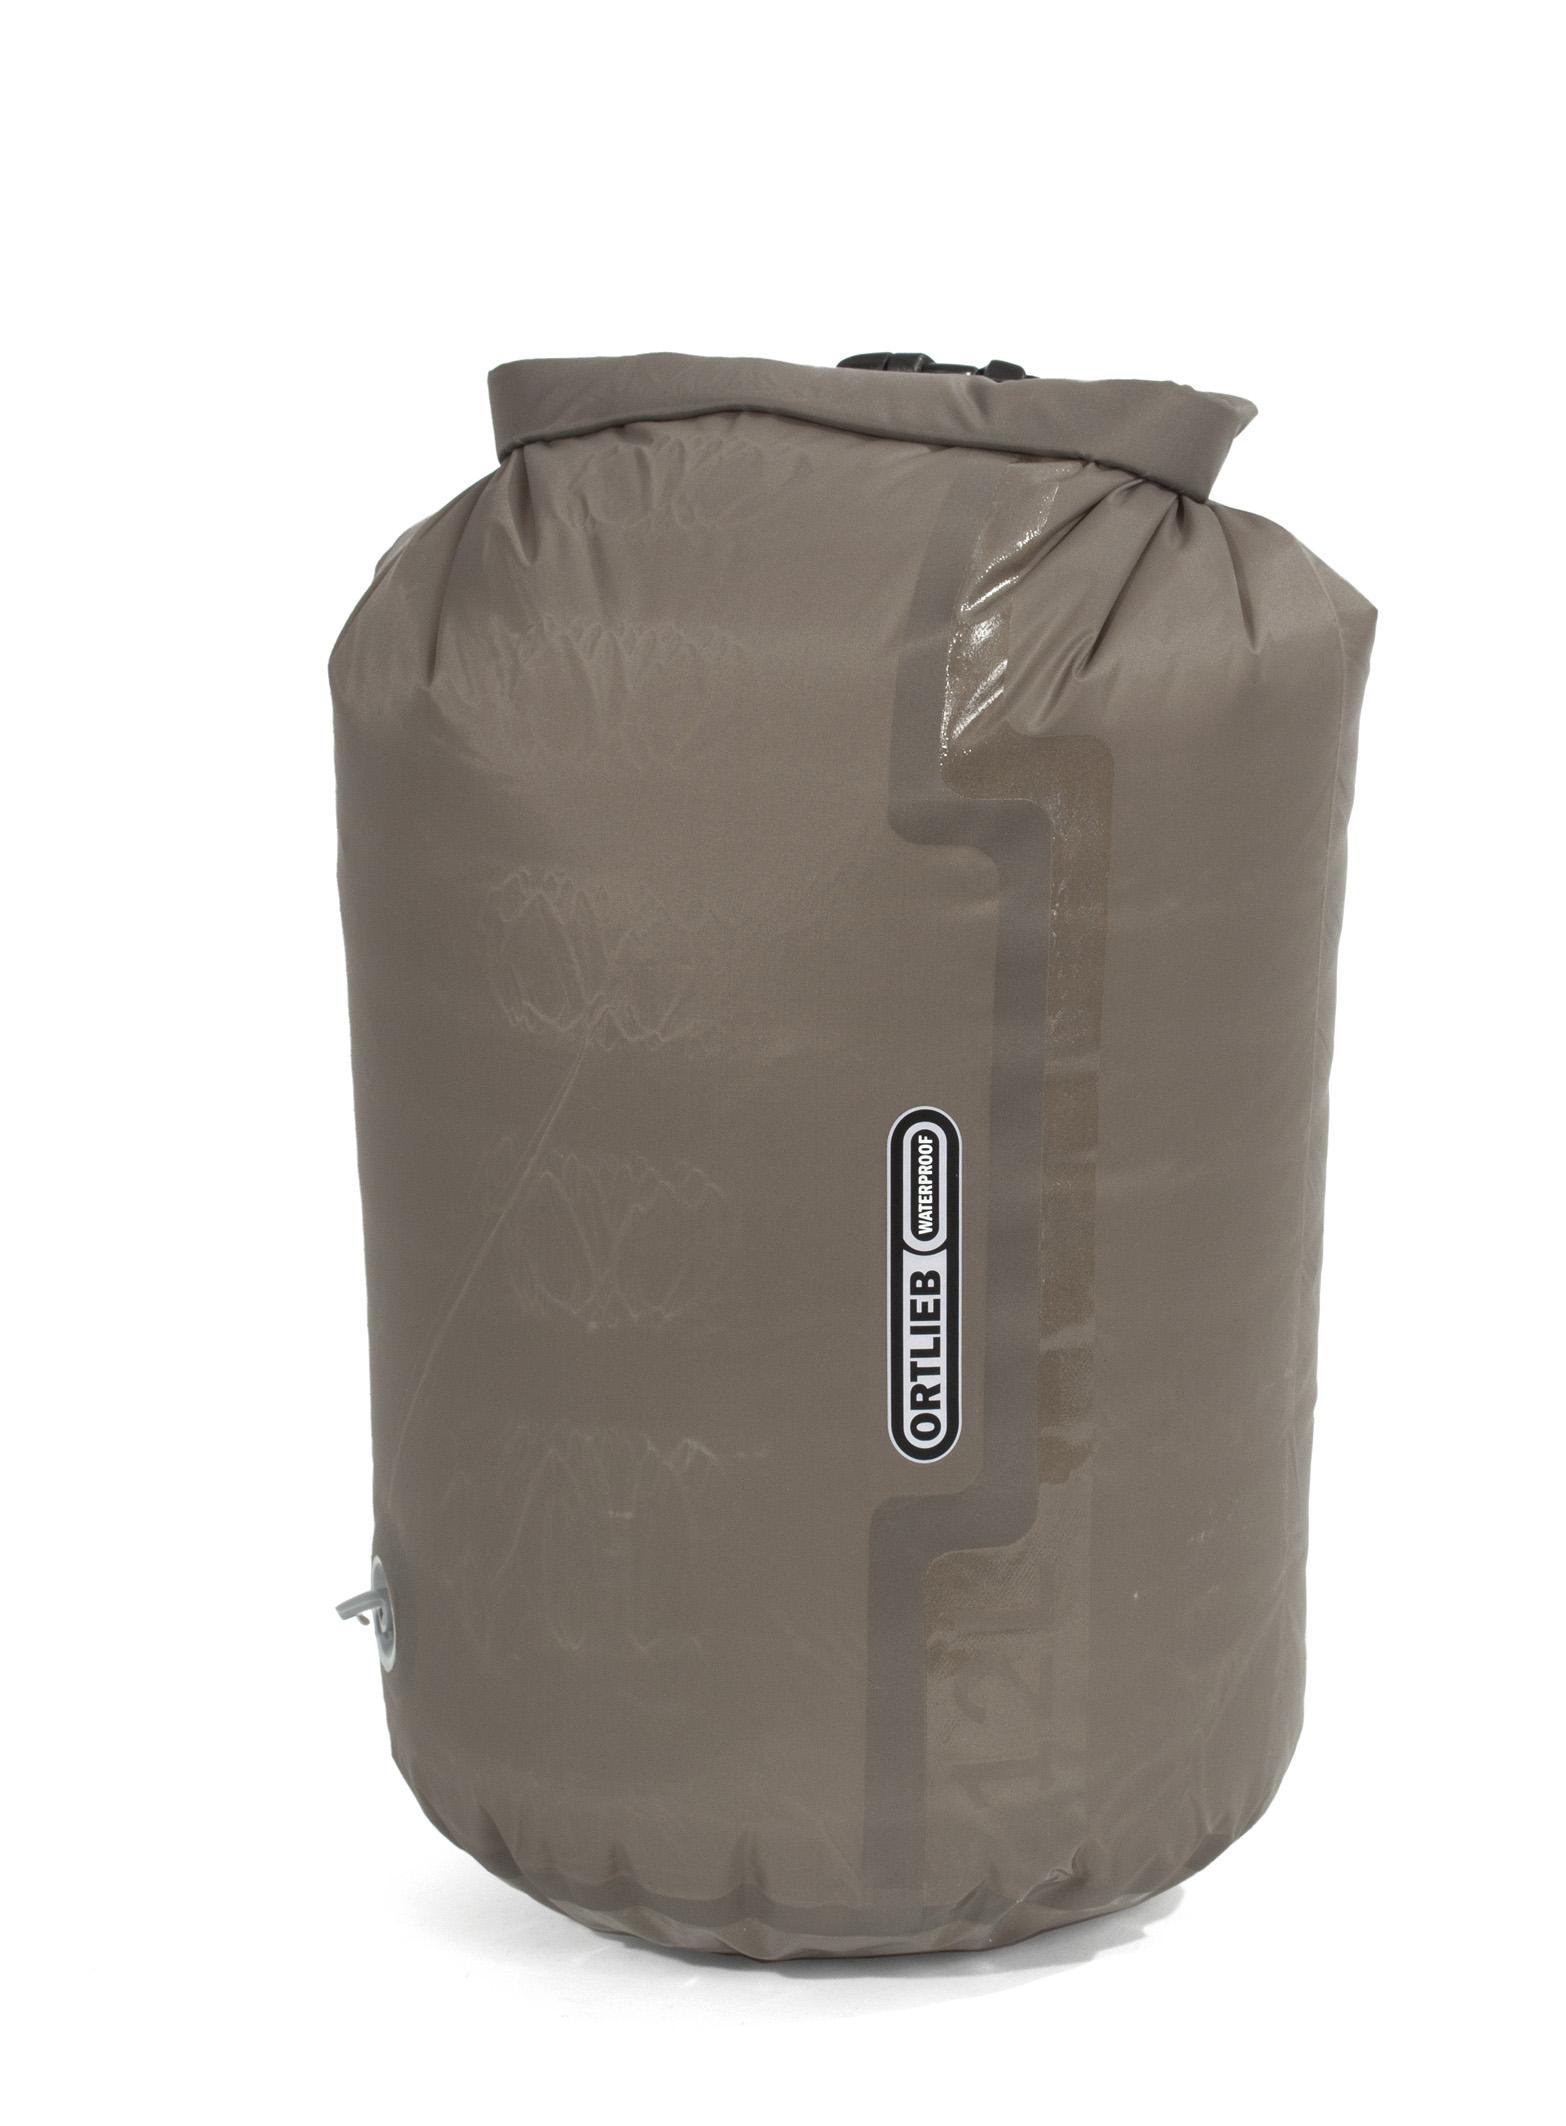 ortlieb packsack ps10 mit ventil packs cke zubeh r rucks cke. Black Bedroom Furniture Sets. Home Design Ideas